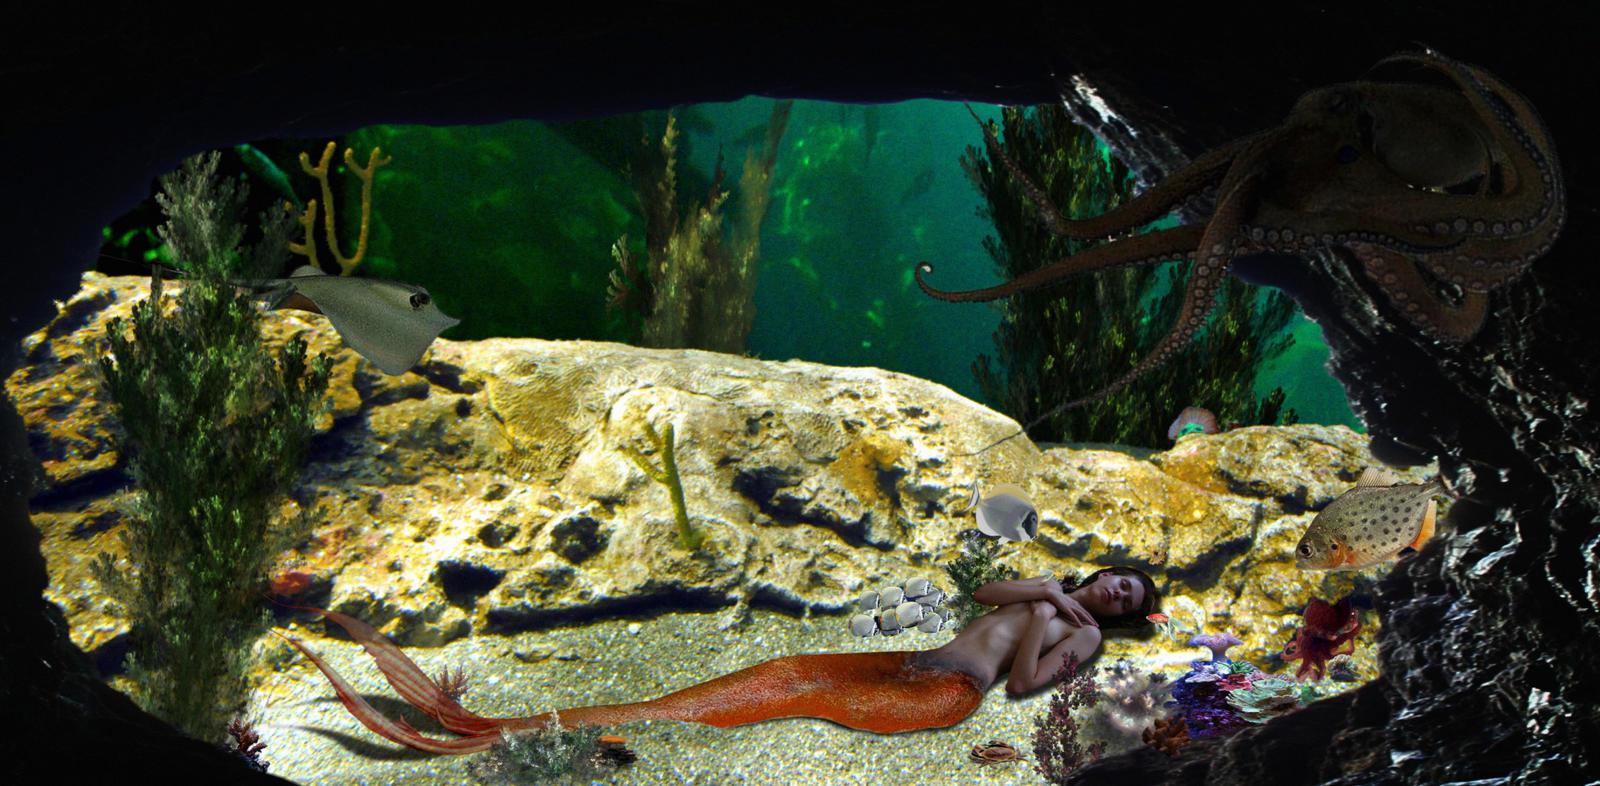 Mermaid Yulia - in the octopus' Garden by sirenabonita